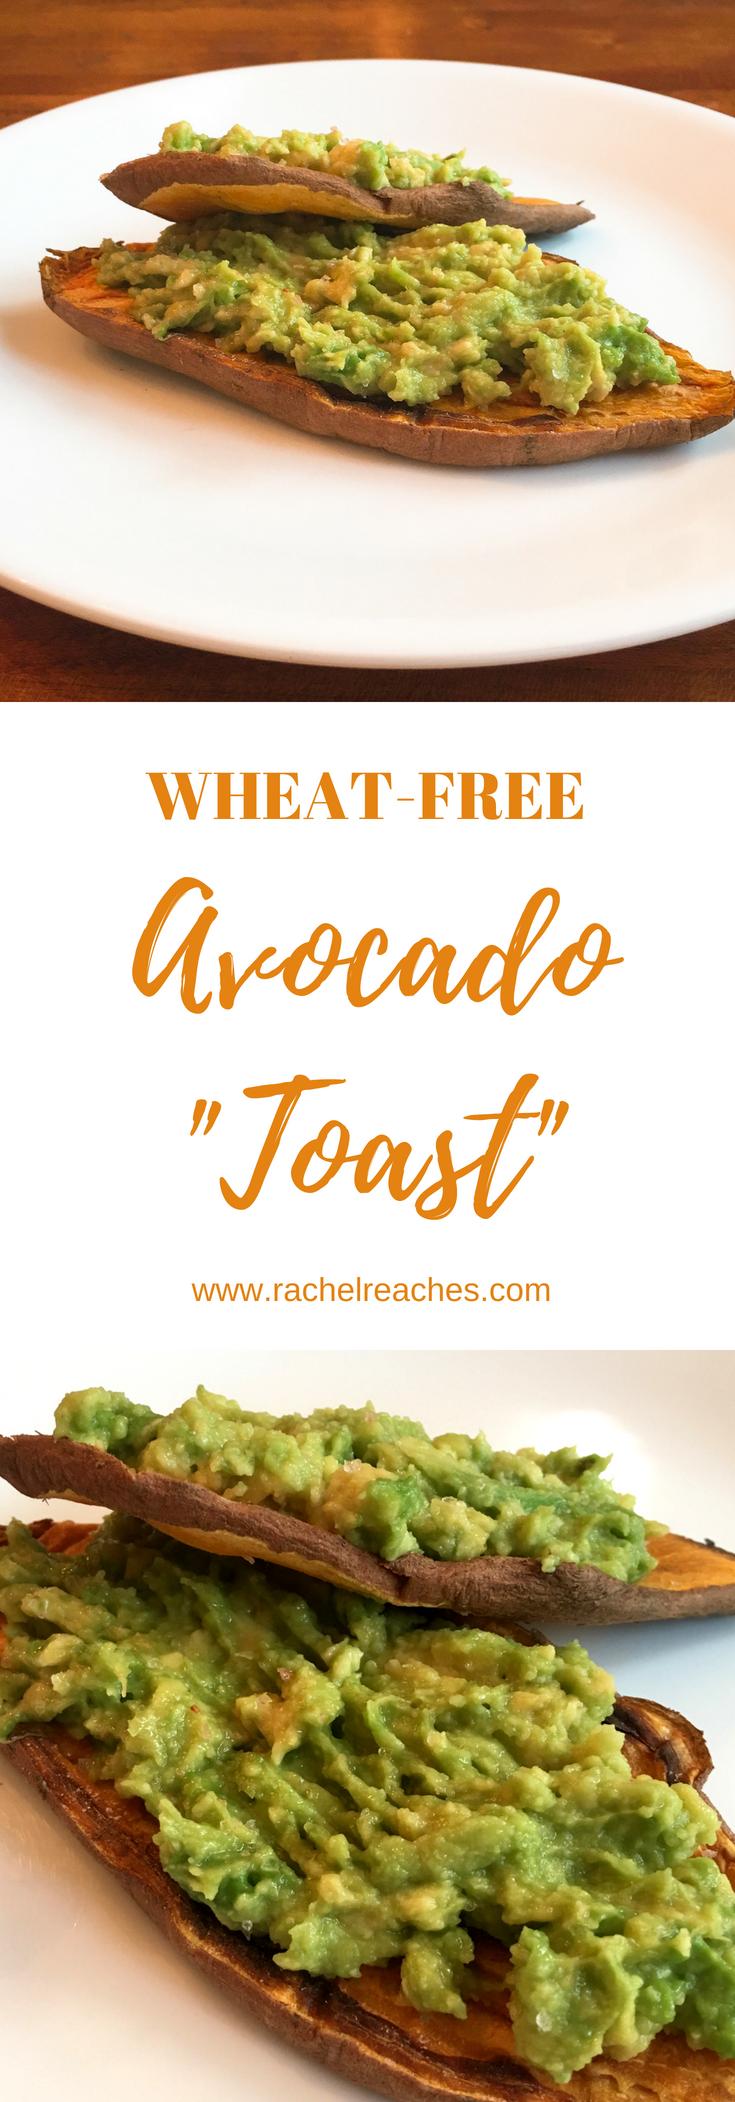 Avocado+_Toast_+Pin+-+Healthy+Recipes.png